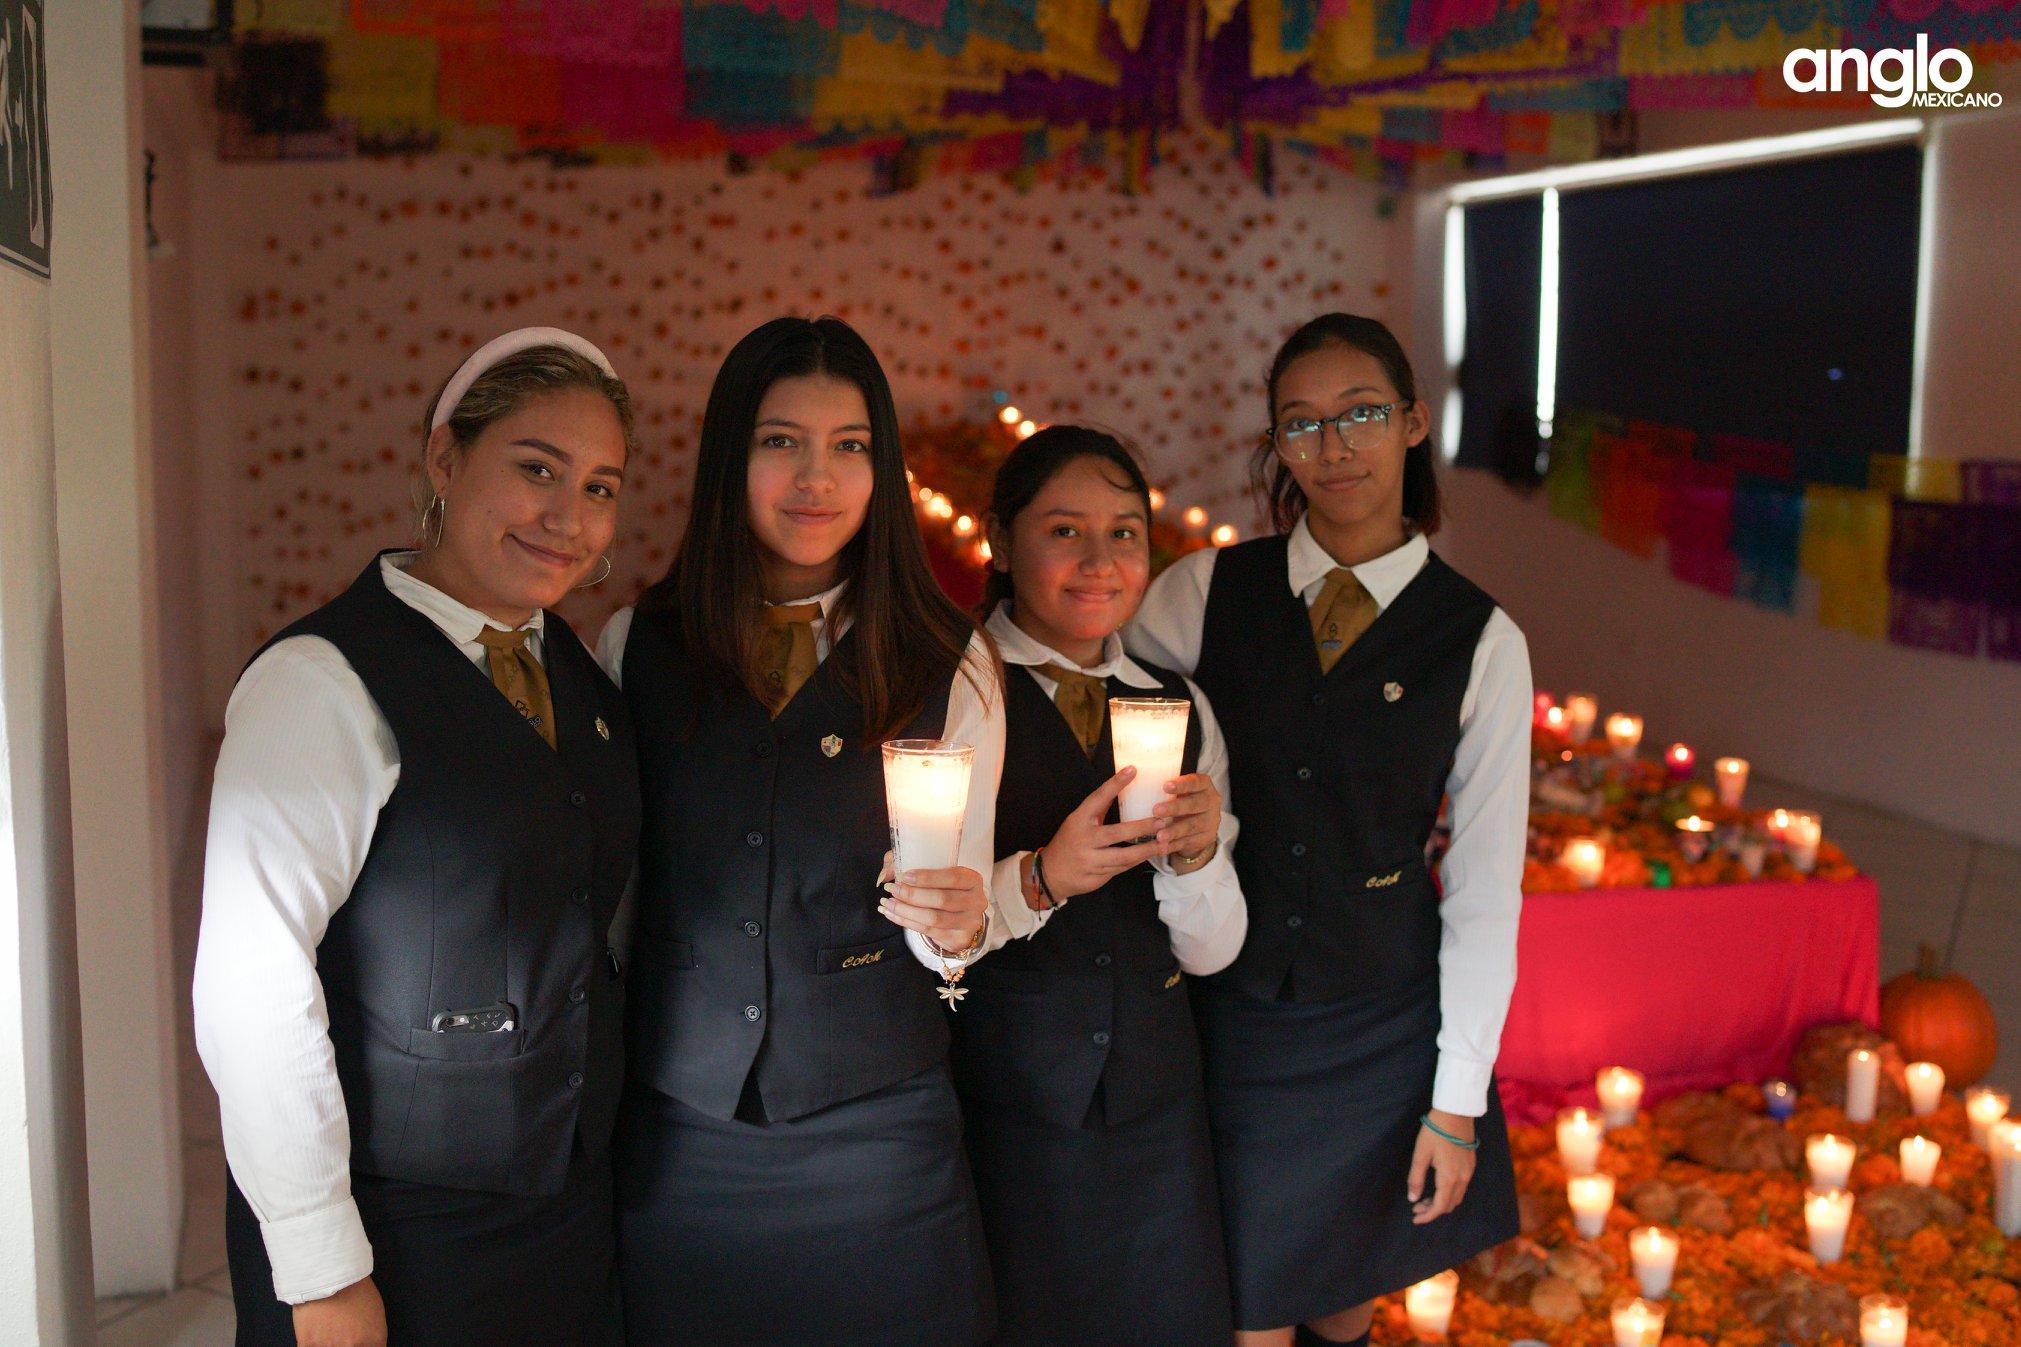 ANGLO MEXICANO DE COATZACOALCOS-VISITA-ALTARES-003